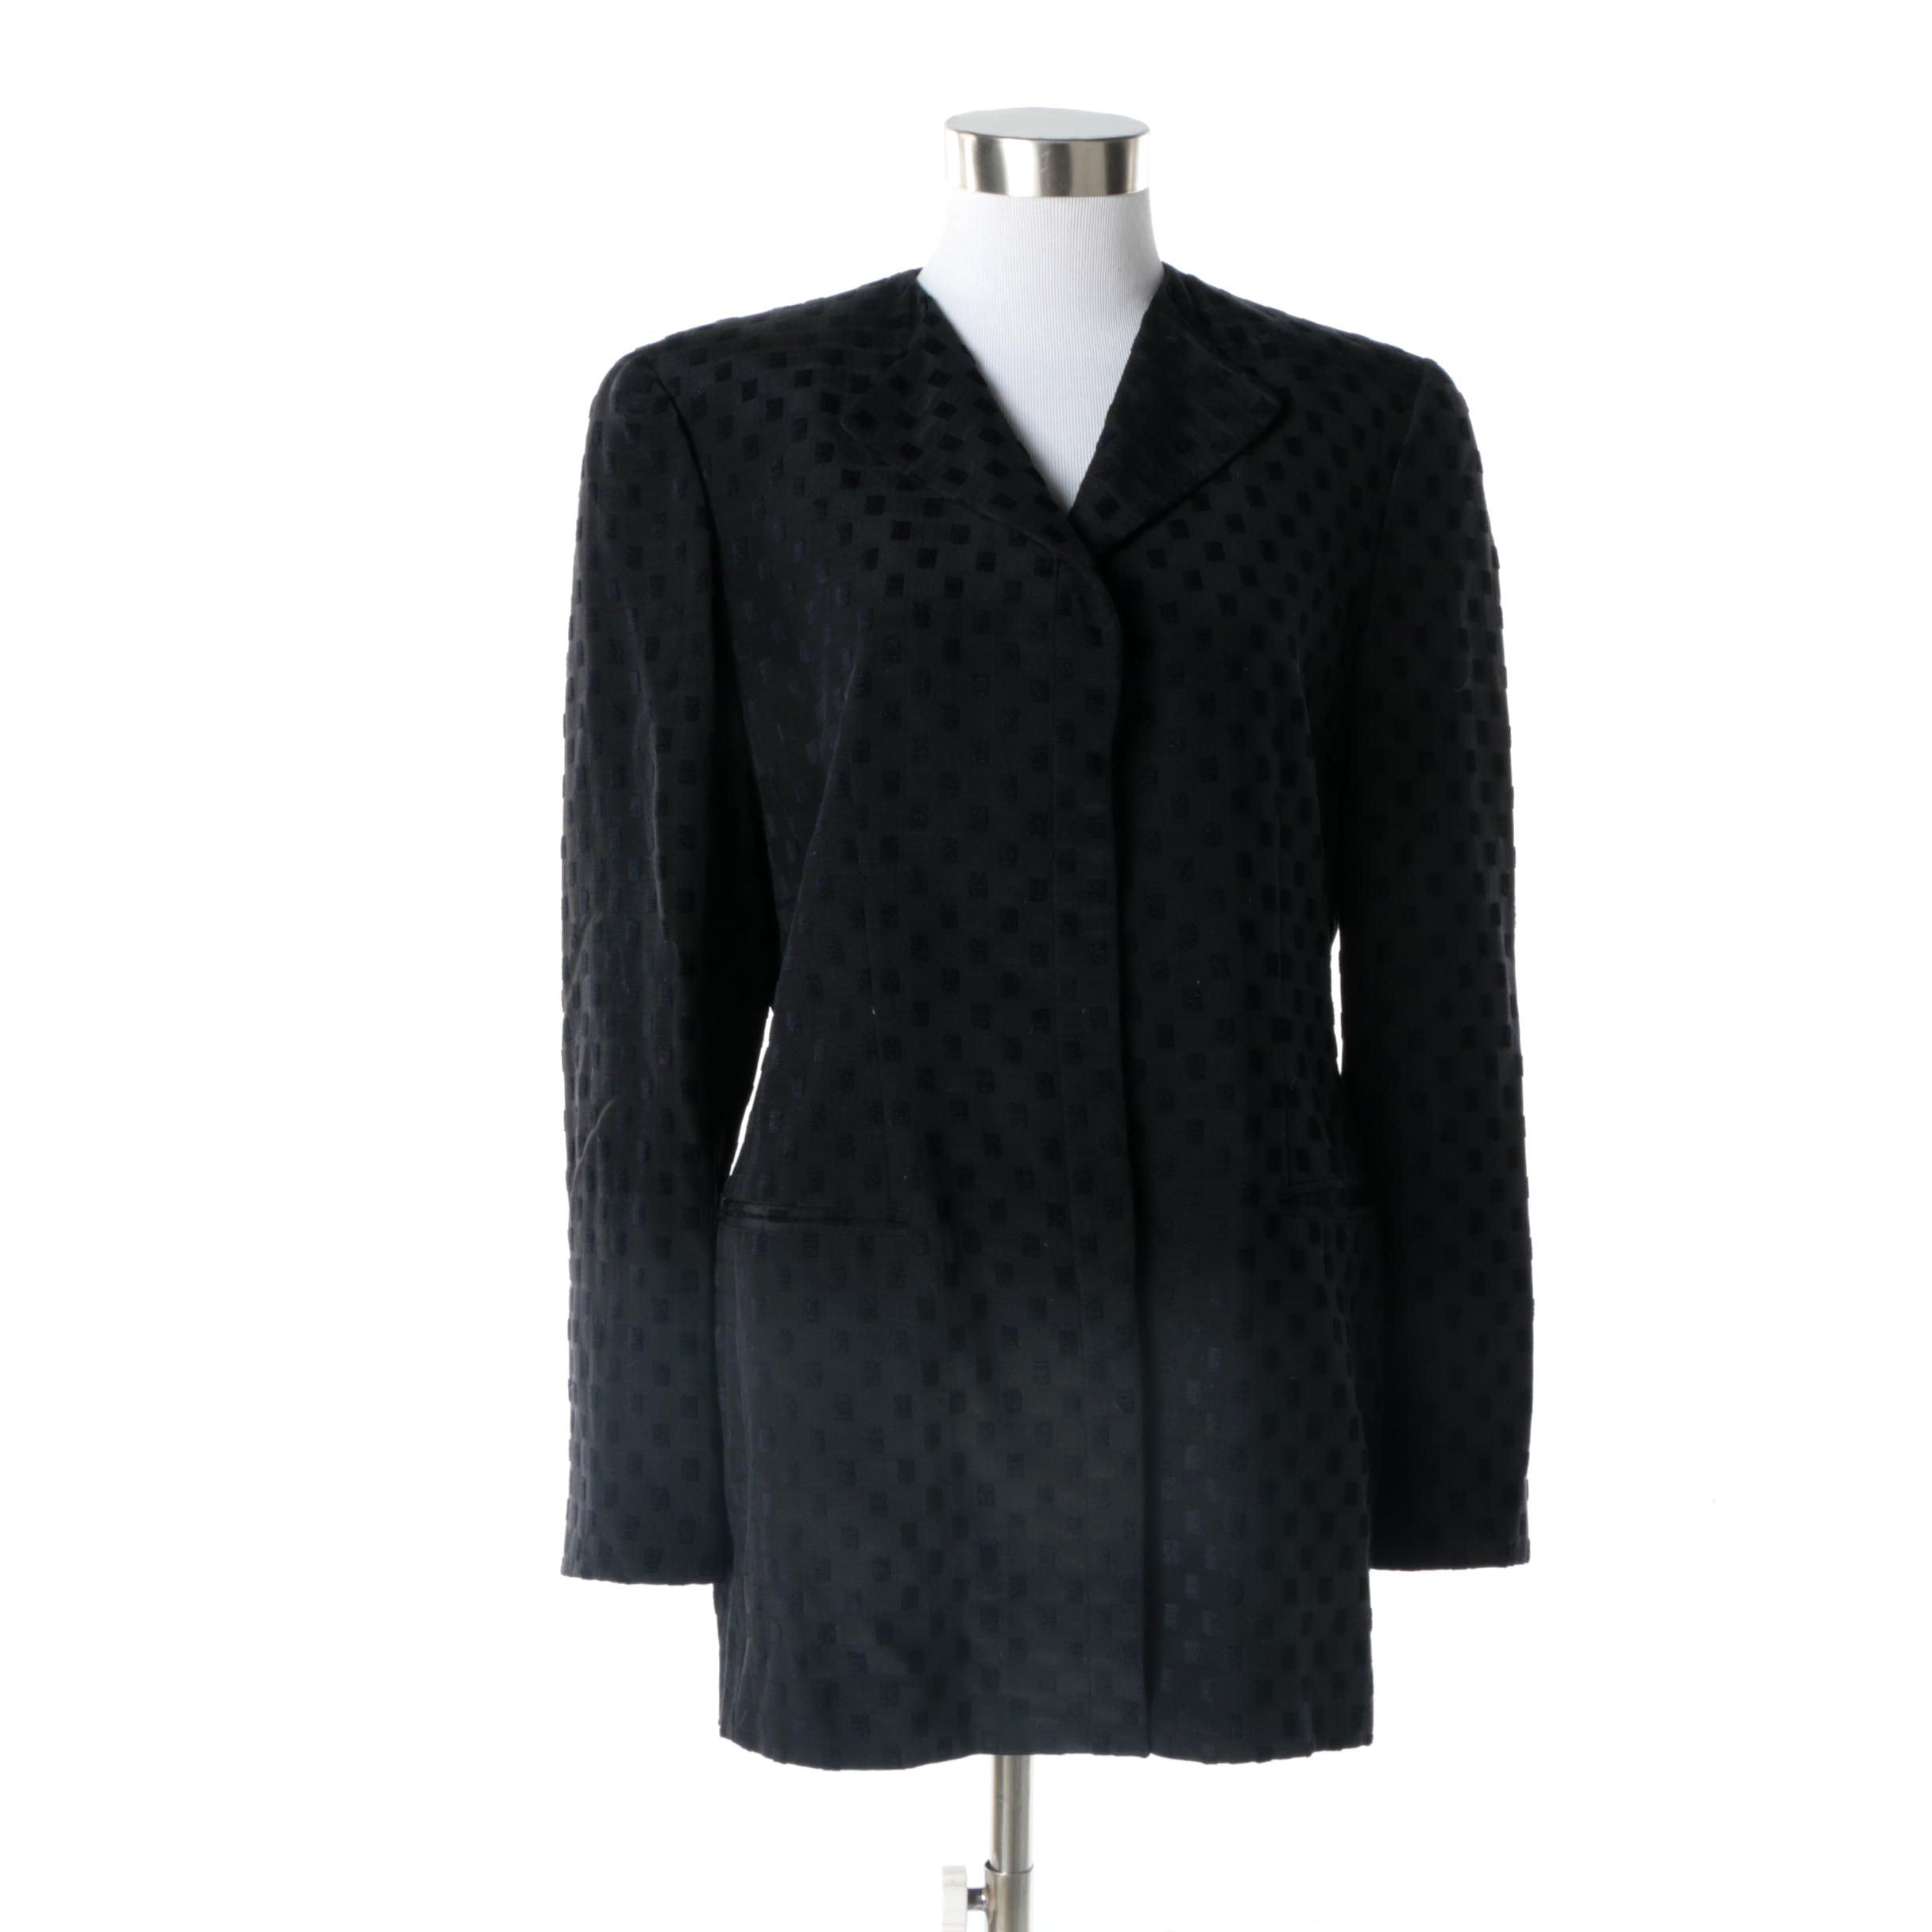 Women's Giorgio Armani Silk and Wool Blend Black Jacket